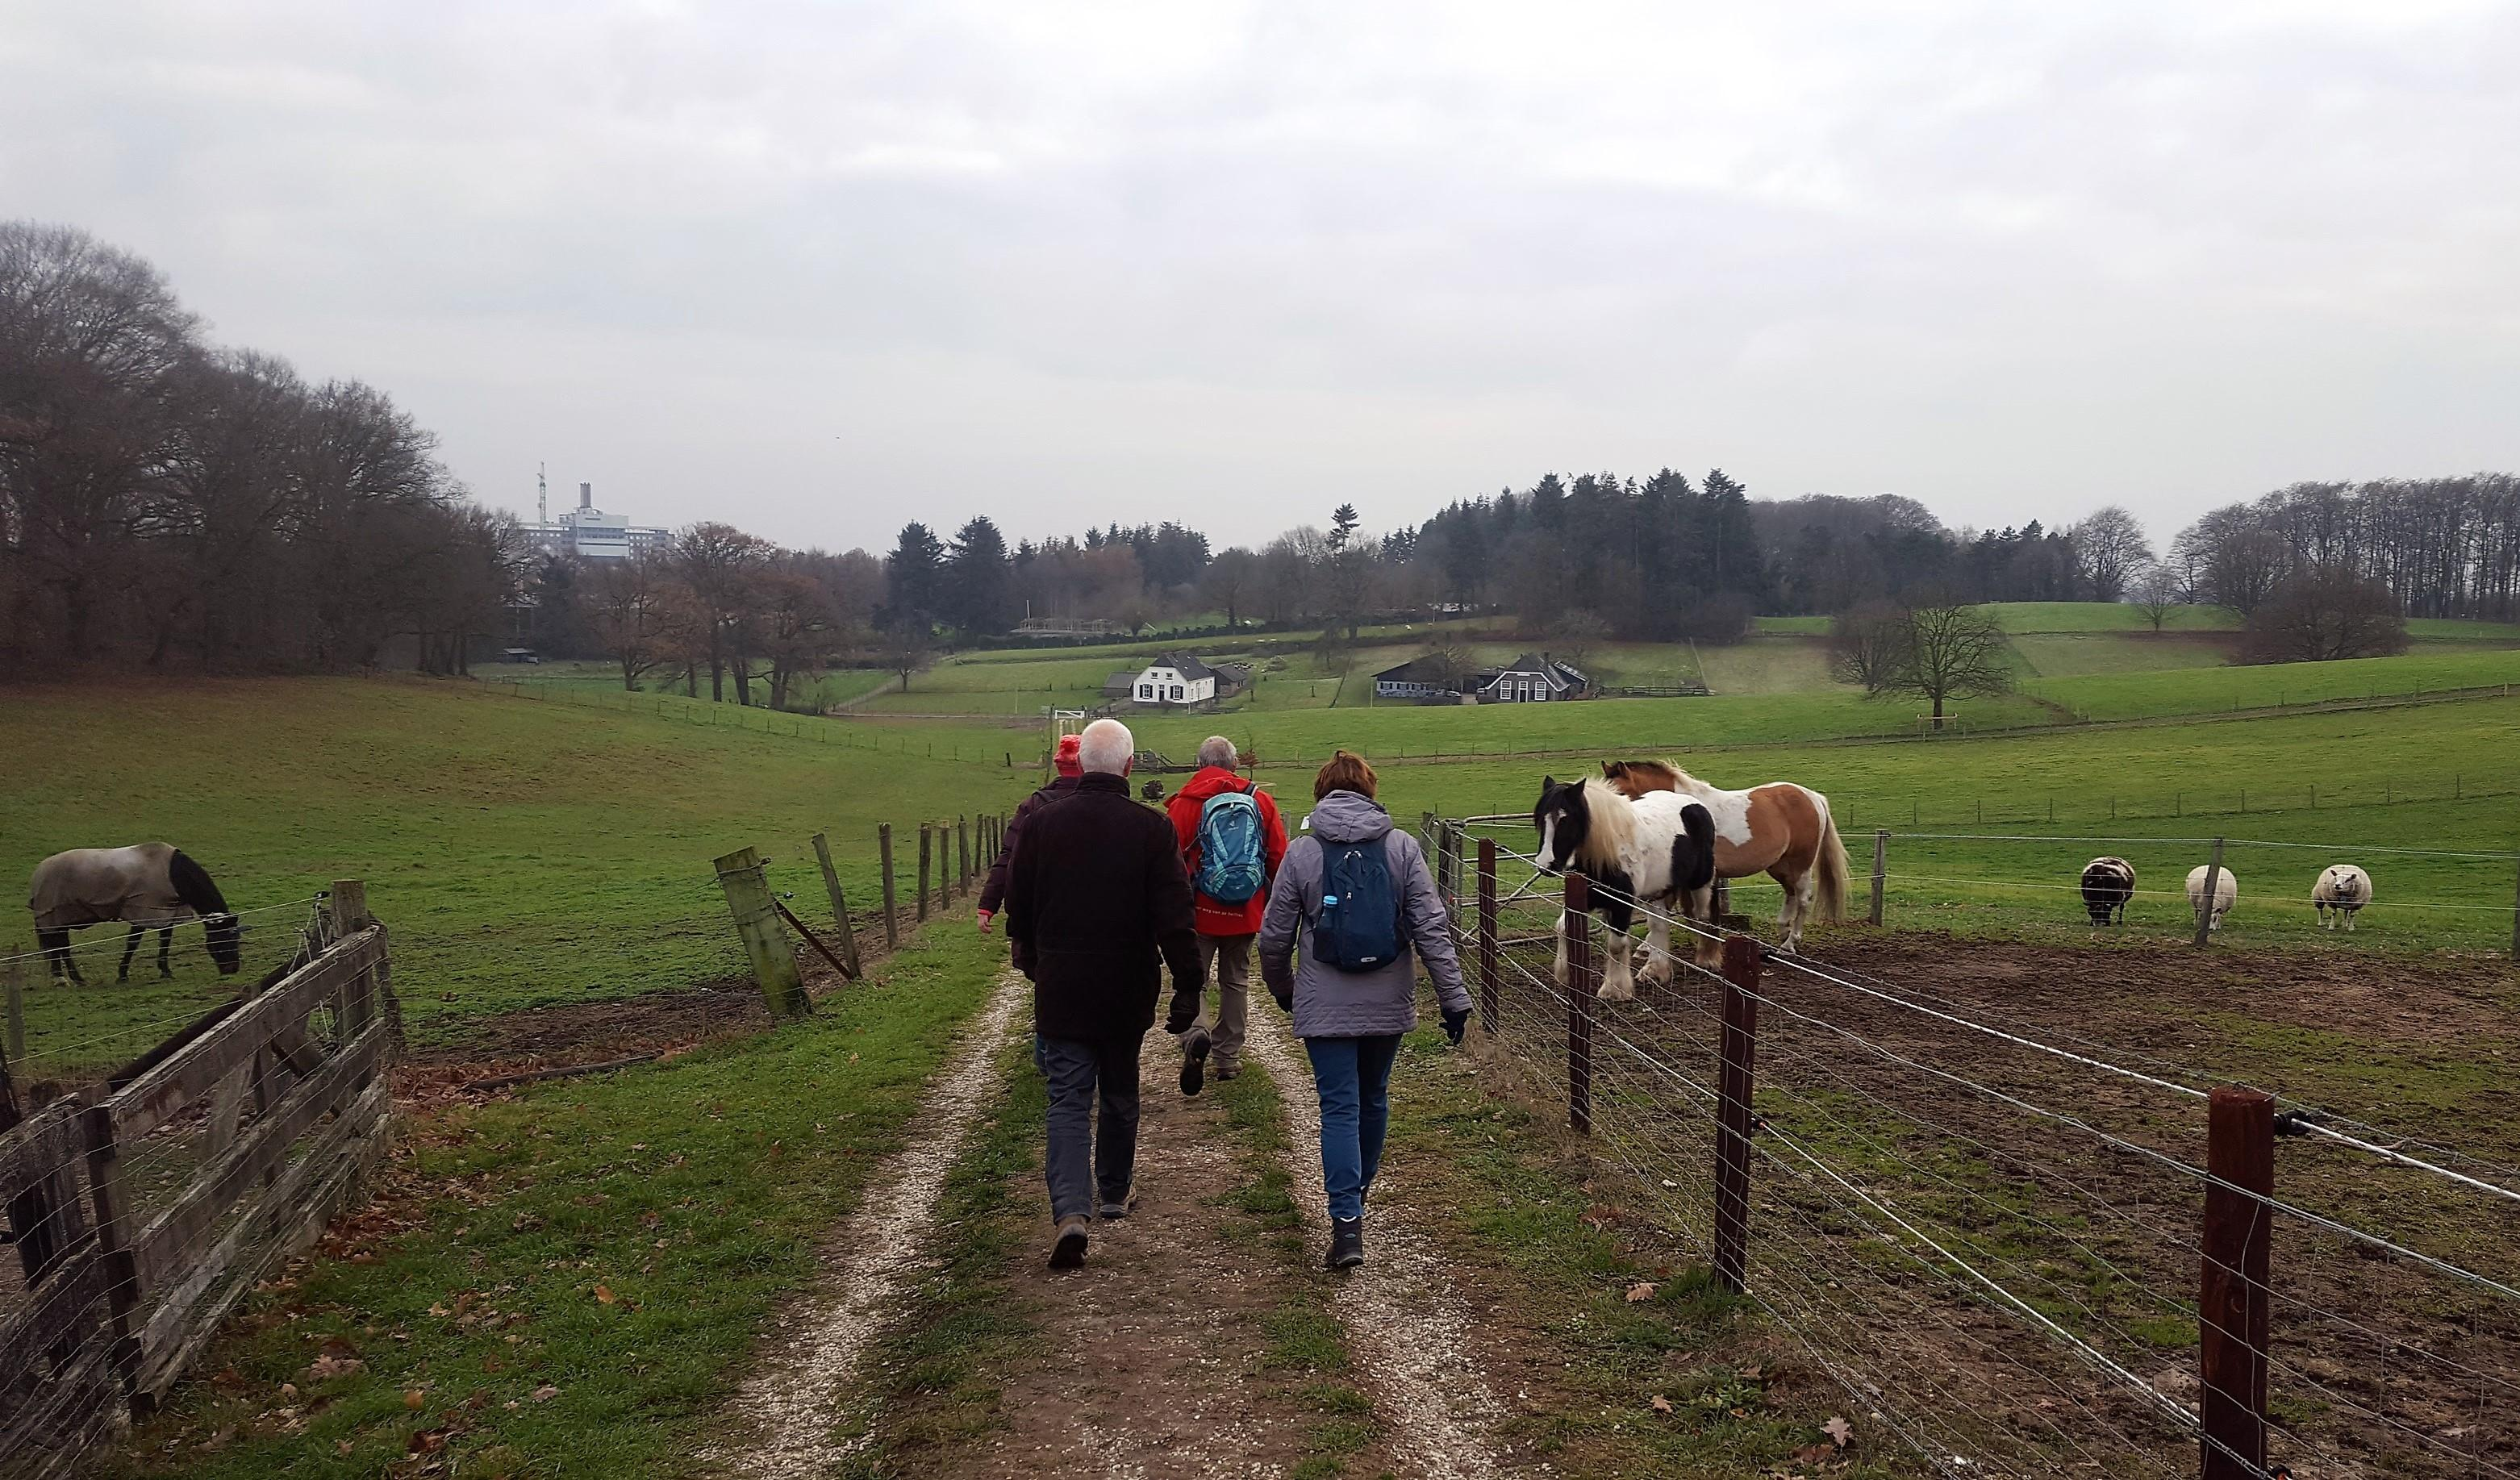 Regio dating Arnhem